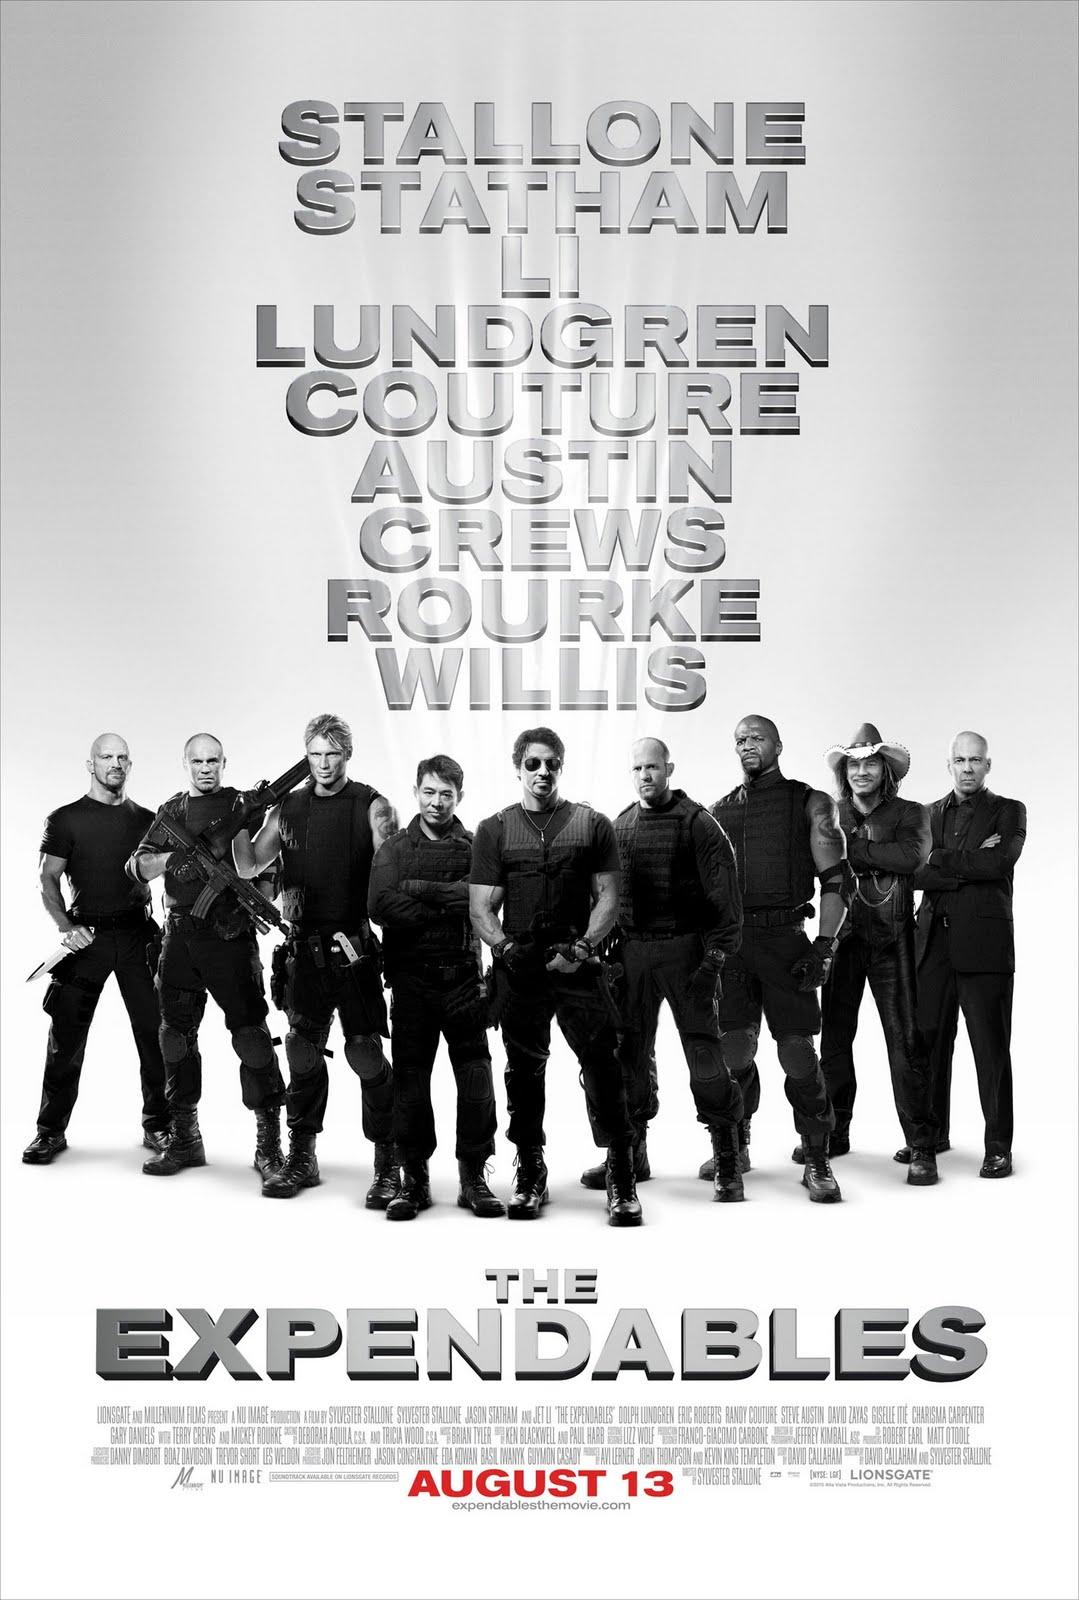 http://1.bp.blogspot.com/_U-_MB3ct83I/TGXIRVVo_eI/AAAAAAAAFwU/9XYgFWTPVBI/s1600/Expendables-Poster.jpg